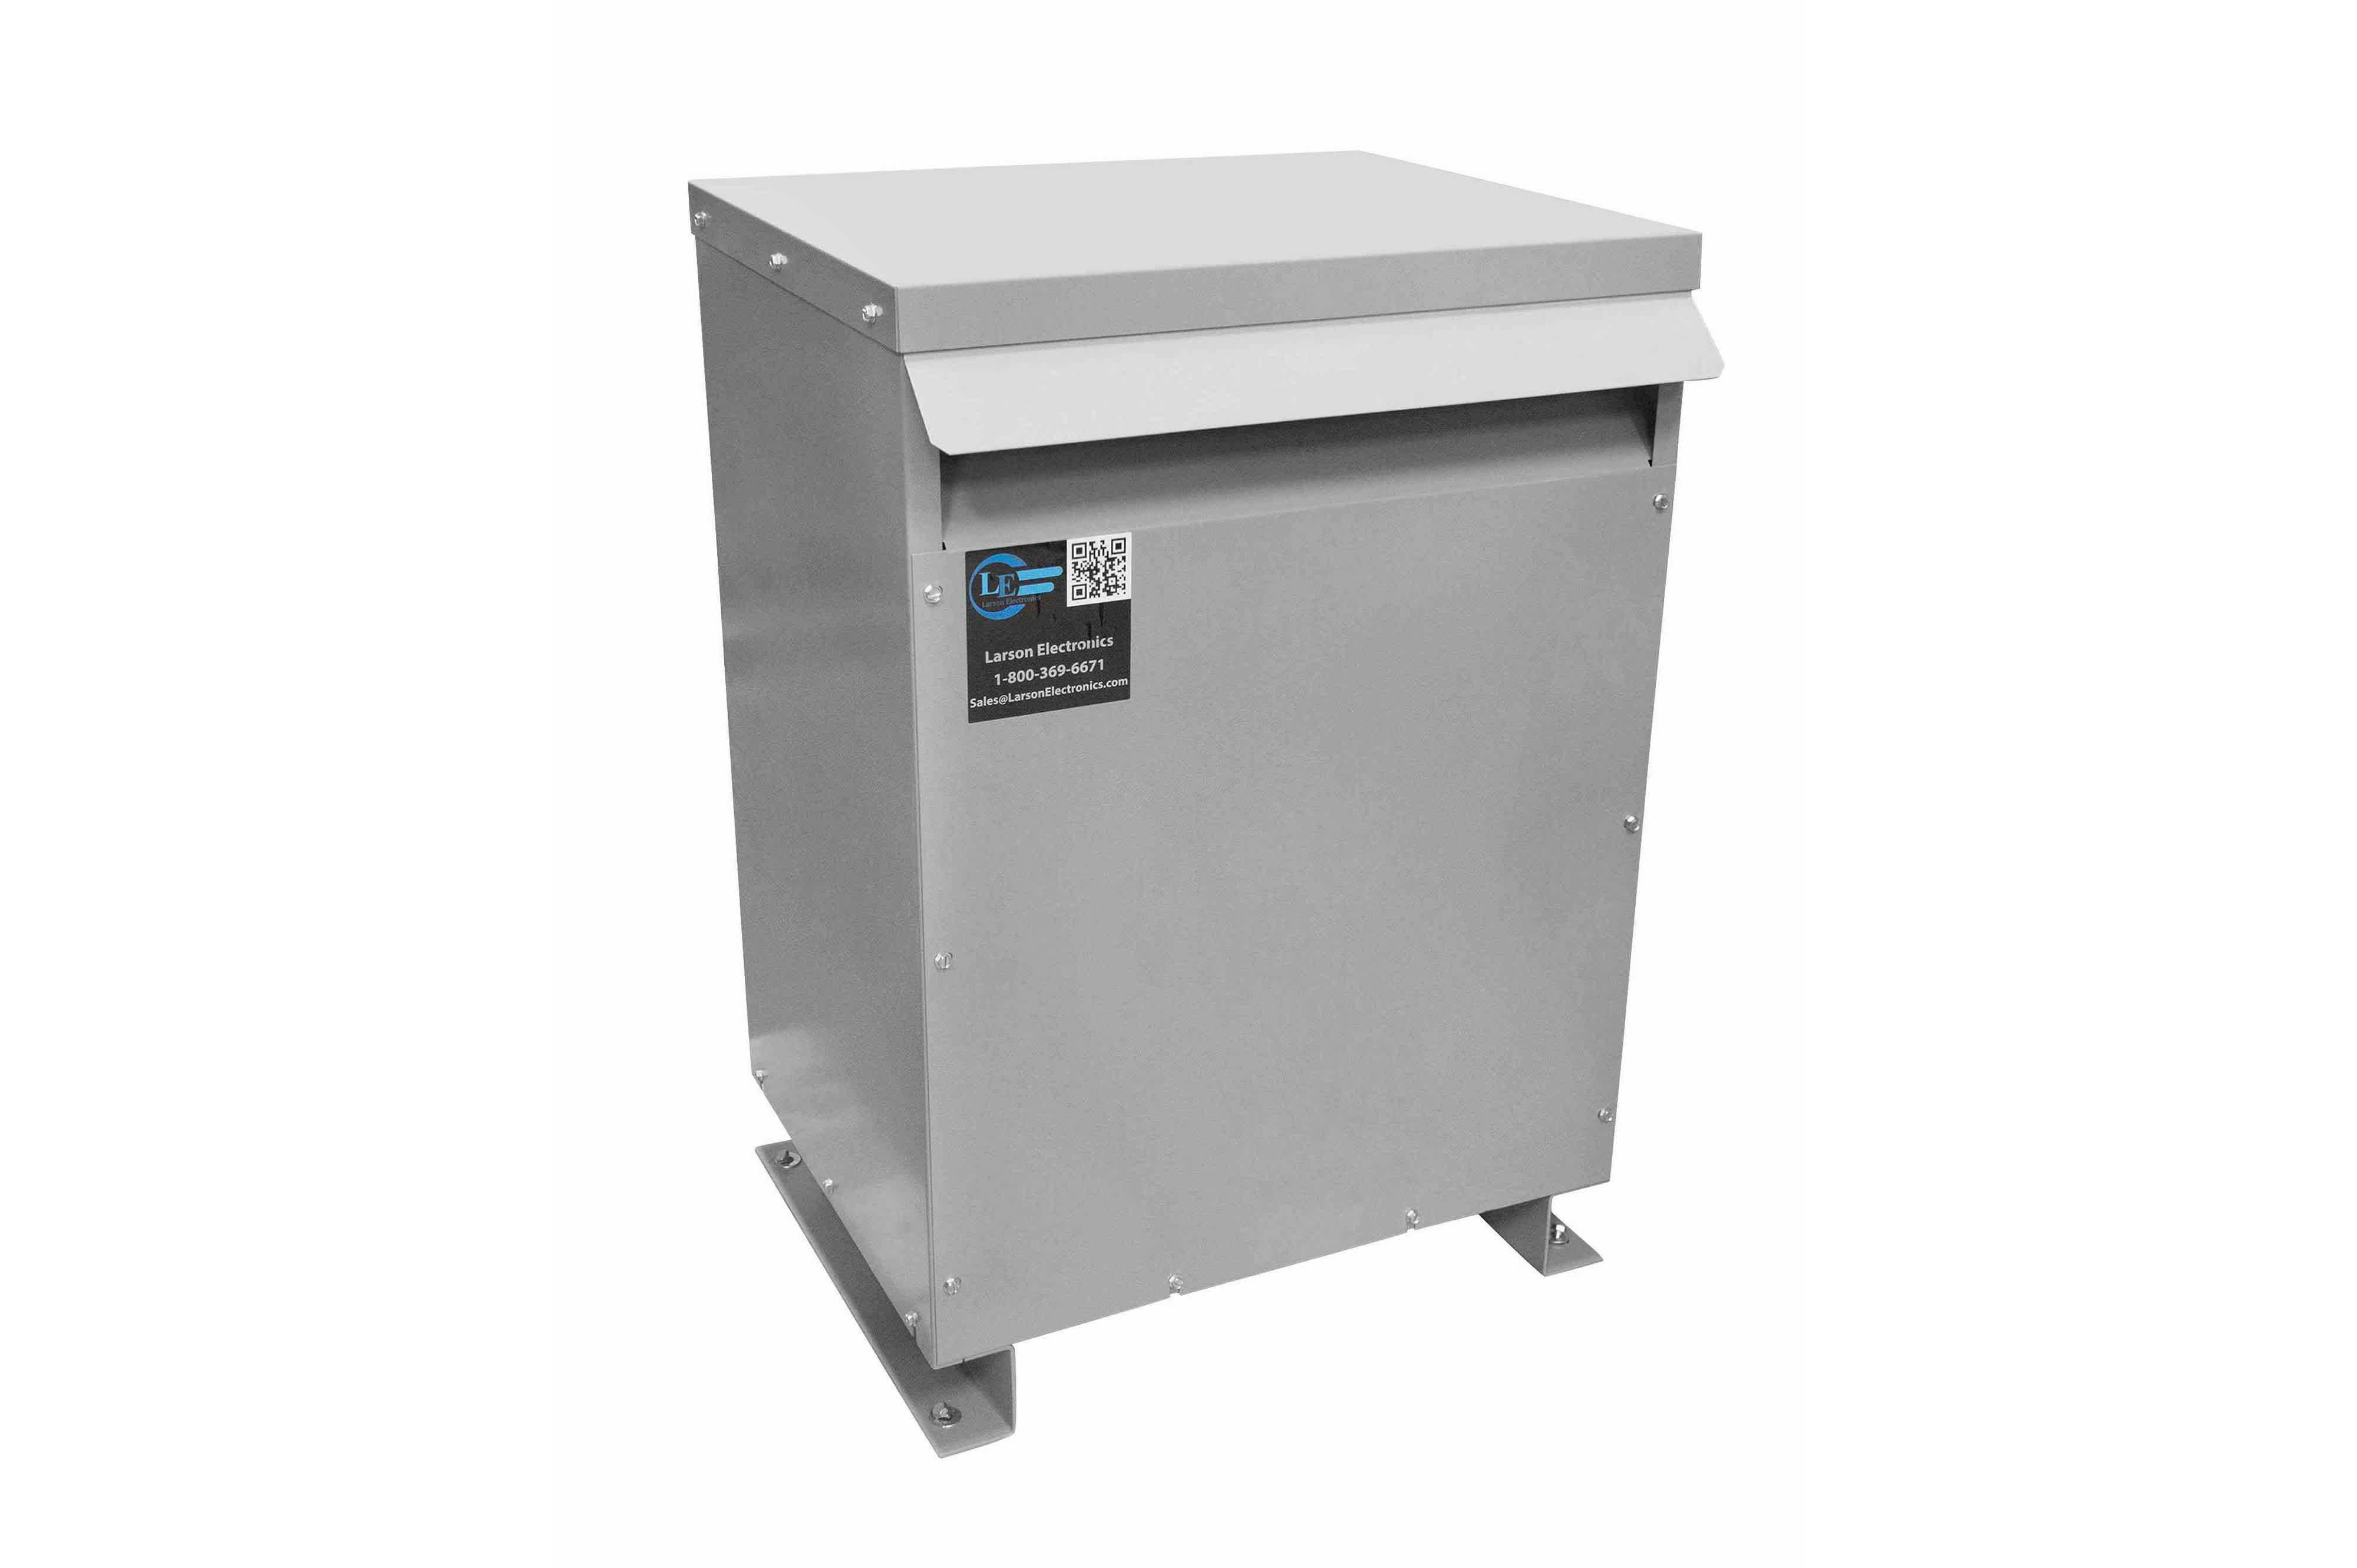 20 kVA 3PH DOE Transformer, 460V Delta Primary, 575Y/332 Wye-N Secondary, N3R, Ventilated, 60 Hz